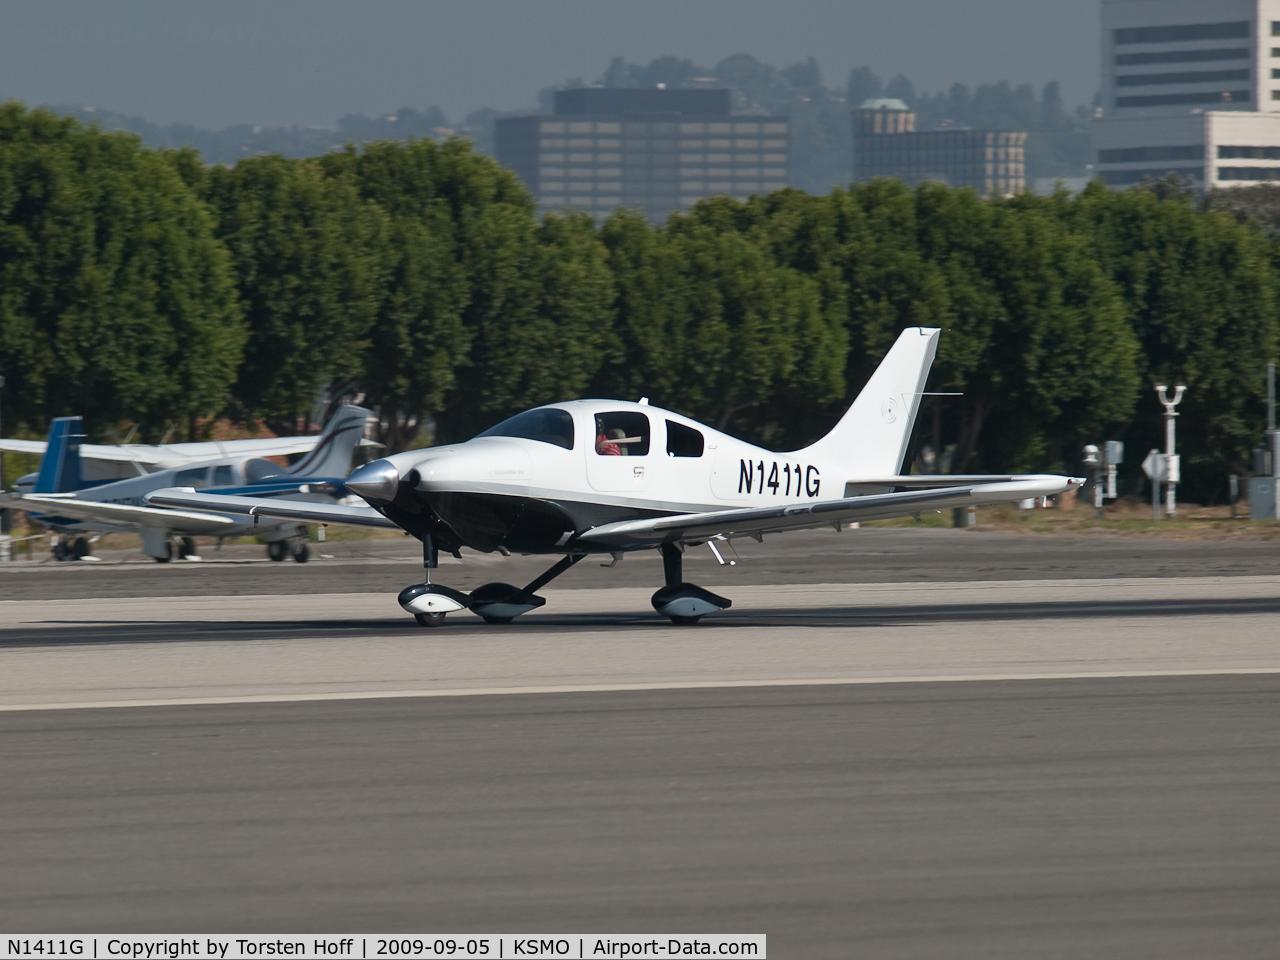 N1411G, 2007 Columbia Aircraft Mfg LC42-550FG C/N 42556, N1411G departing from RWY 21